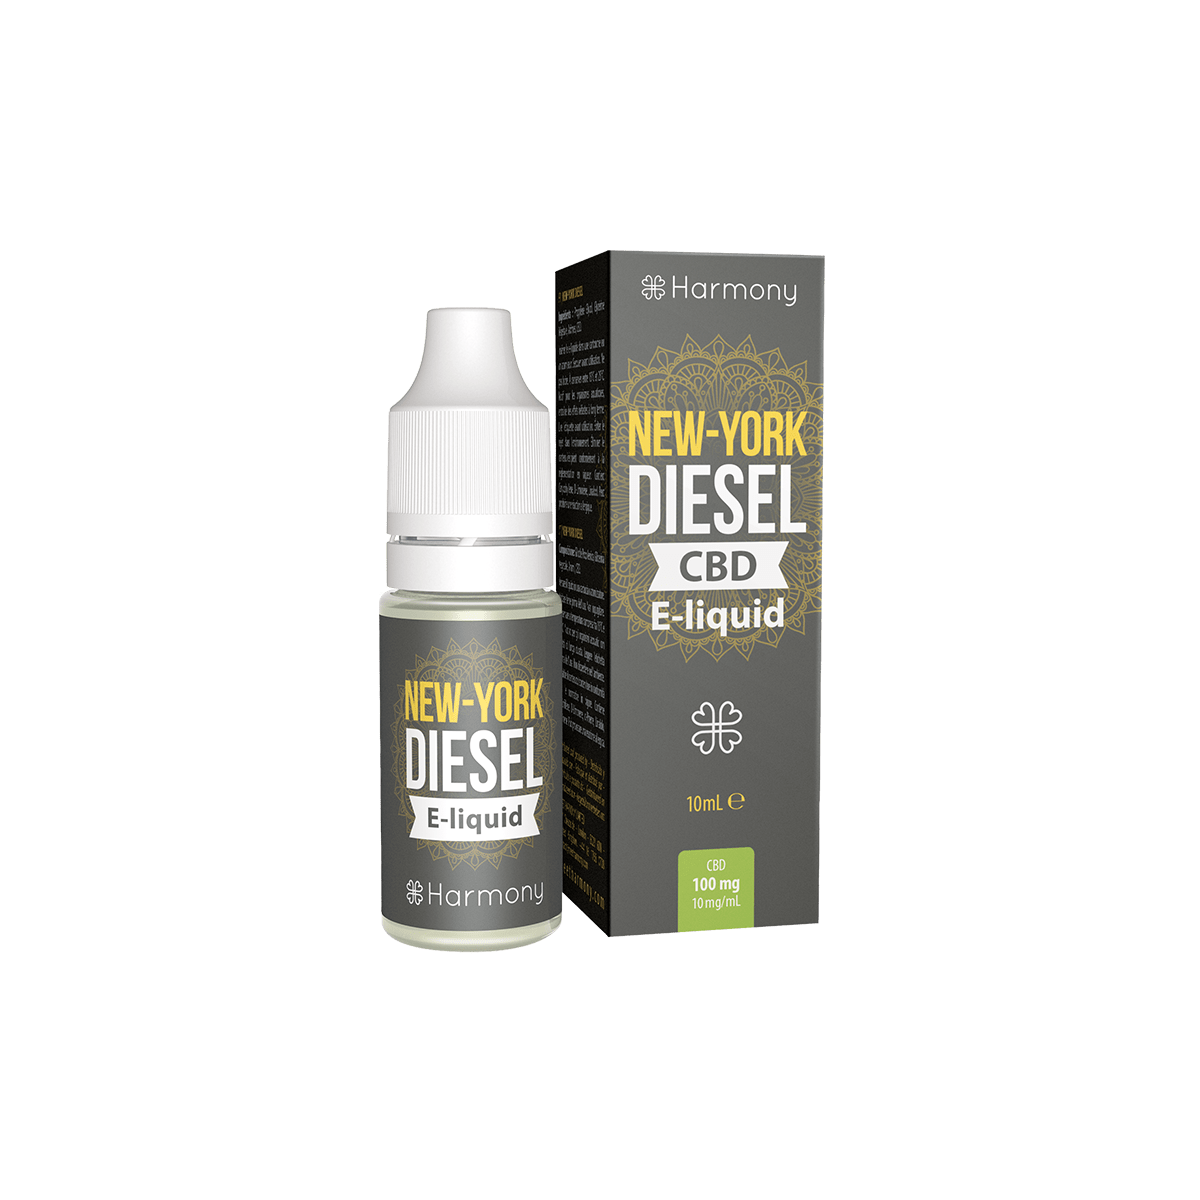 CBD Liquid | HARMONY New York Diesel | Menge 10 ml - 100 mg